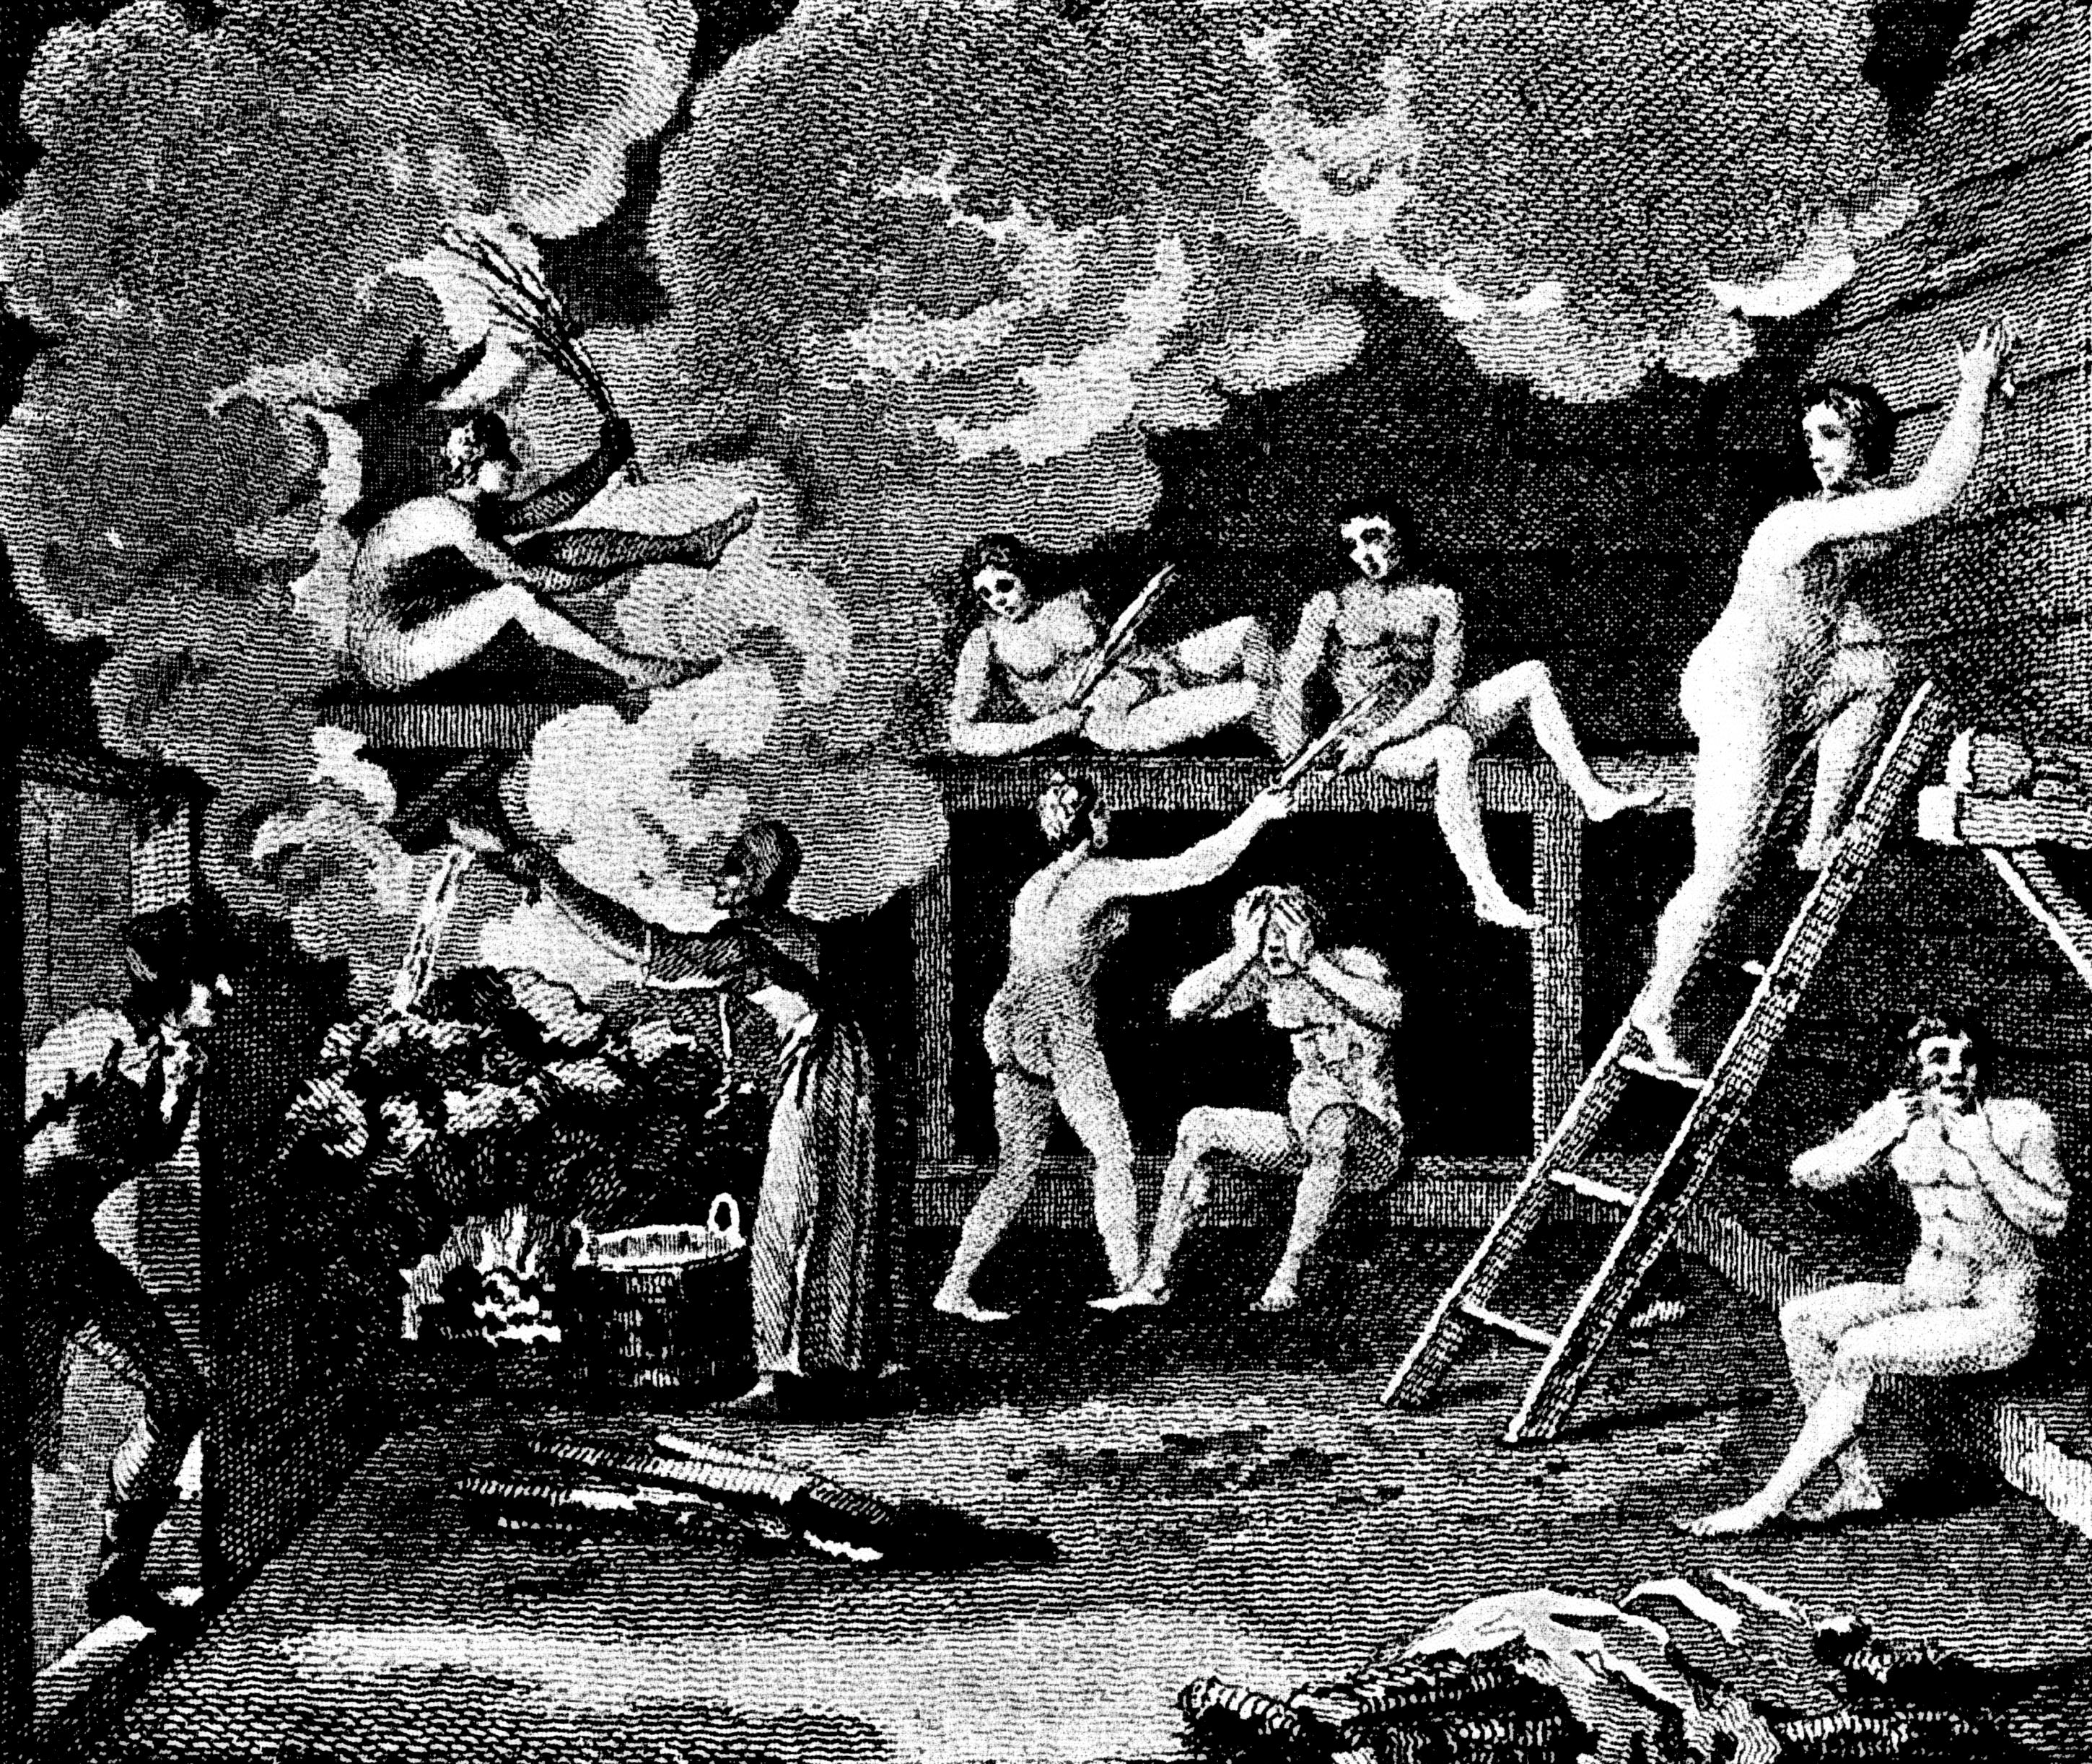 Kuva: Wikimedia Commons (Public Domain)